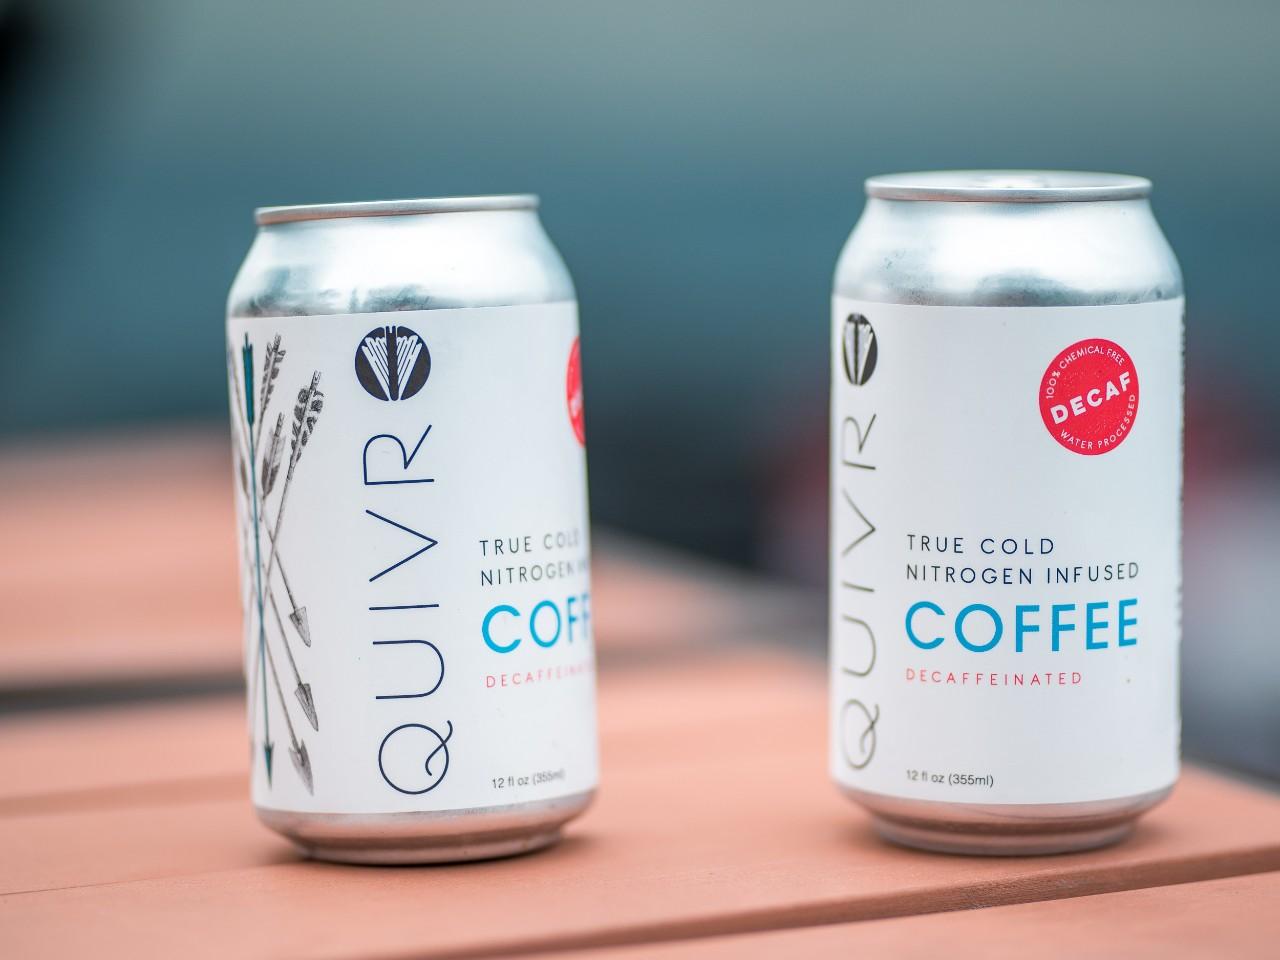 decaf-coffee-benefits